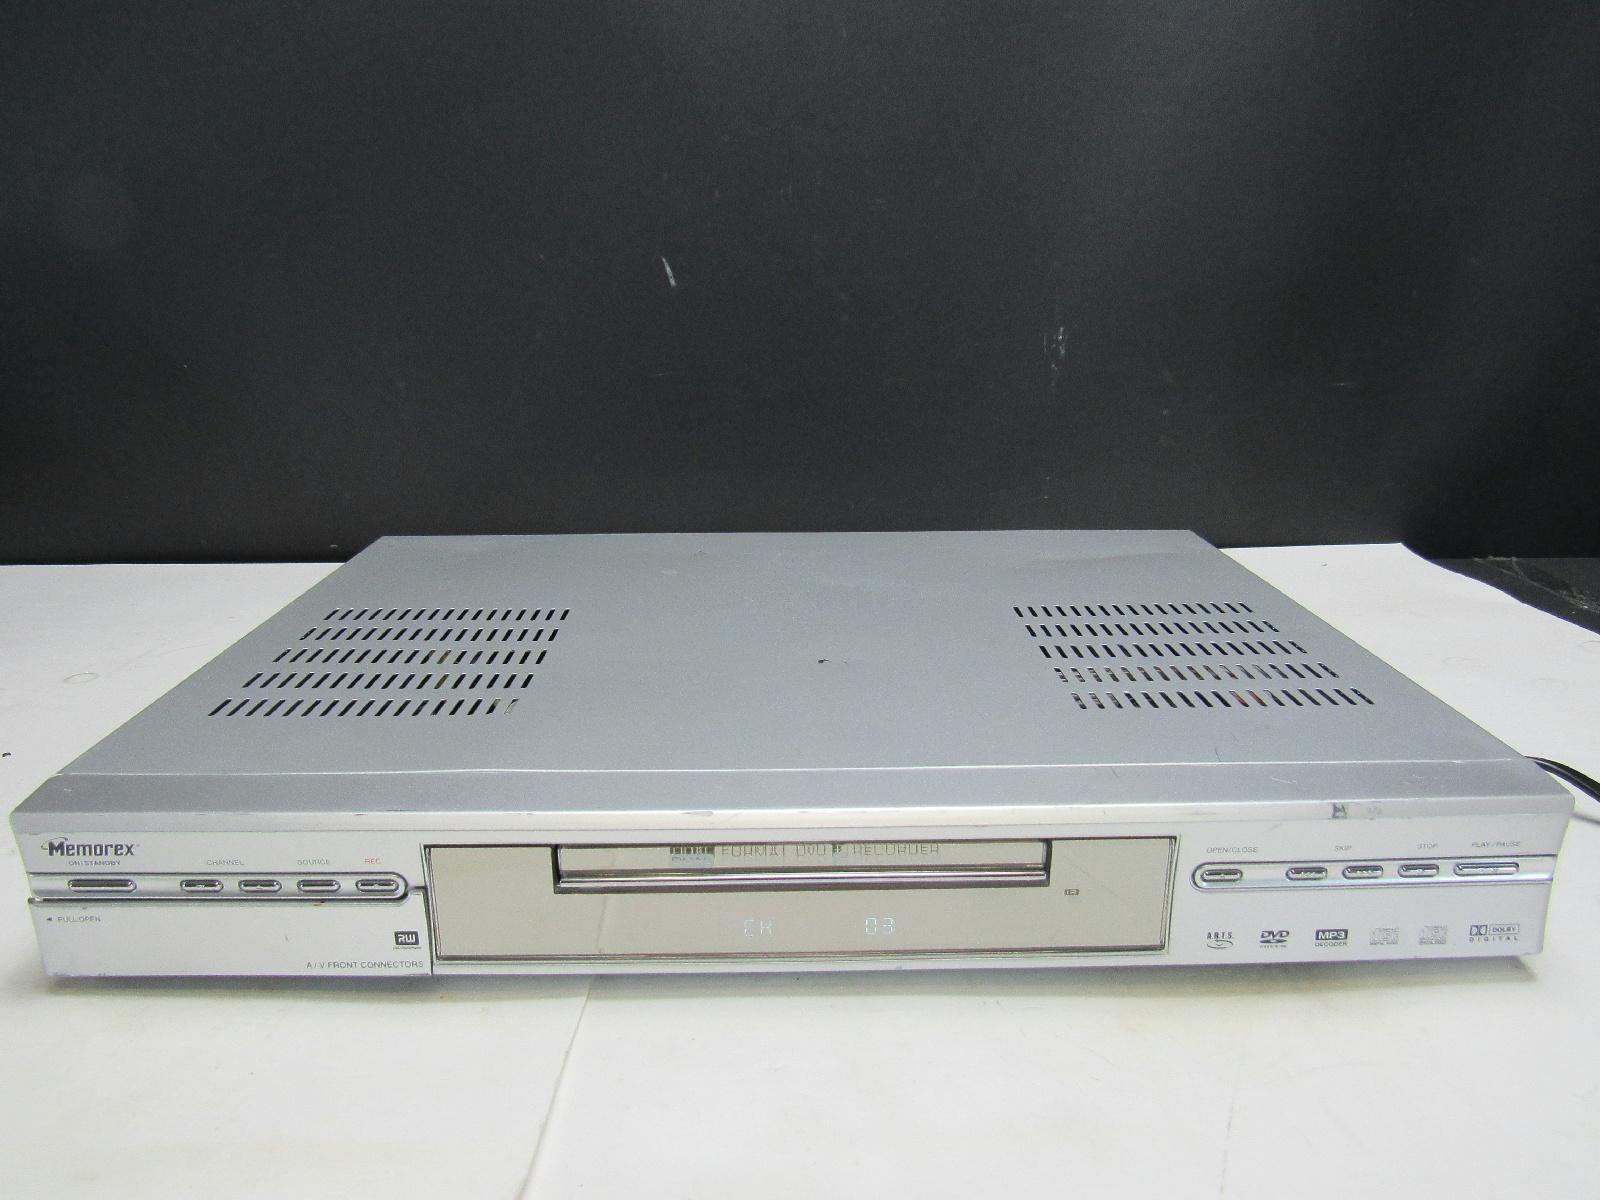 memorex dvd recorder mvdr2102 manual diamante insangerate film rh itemdraft ga Memorex Drivers Windows 8 Memorex CD Drivers